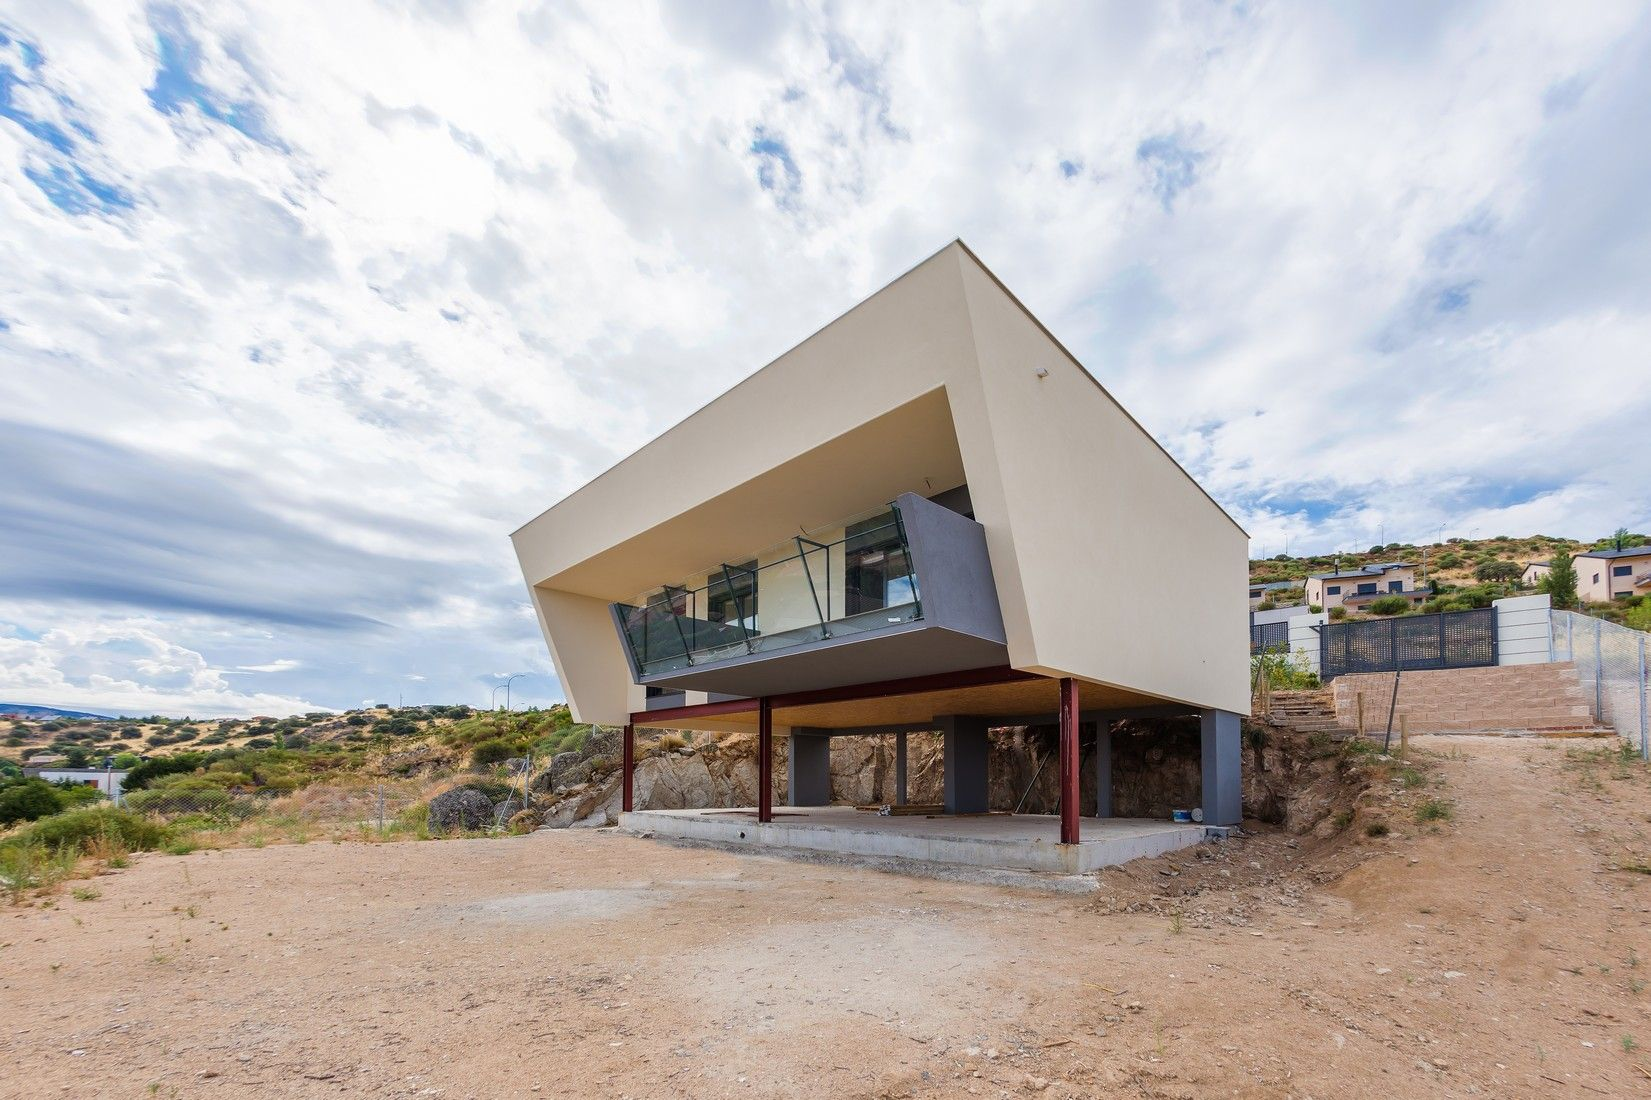 TREBOL - Steel modular home projects